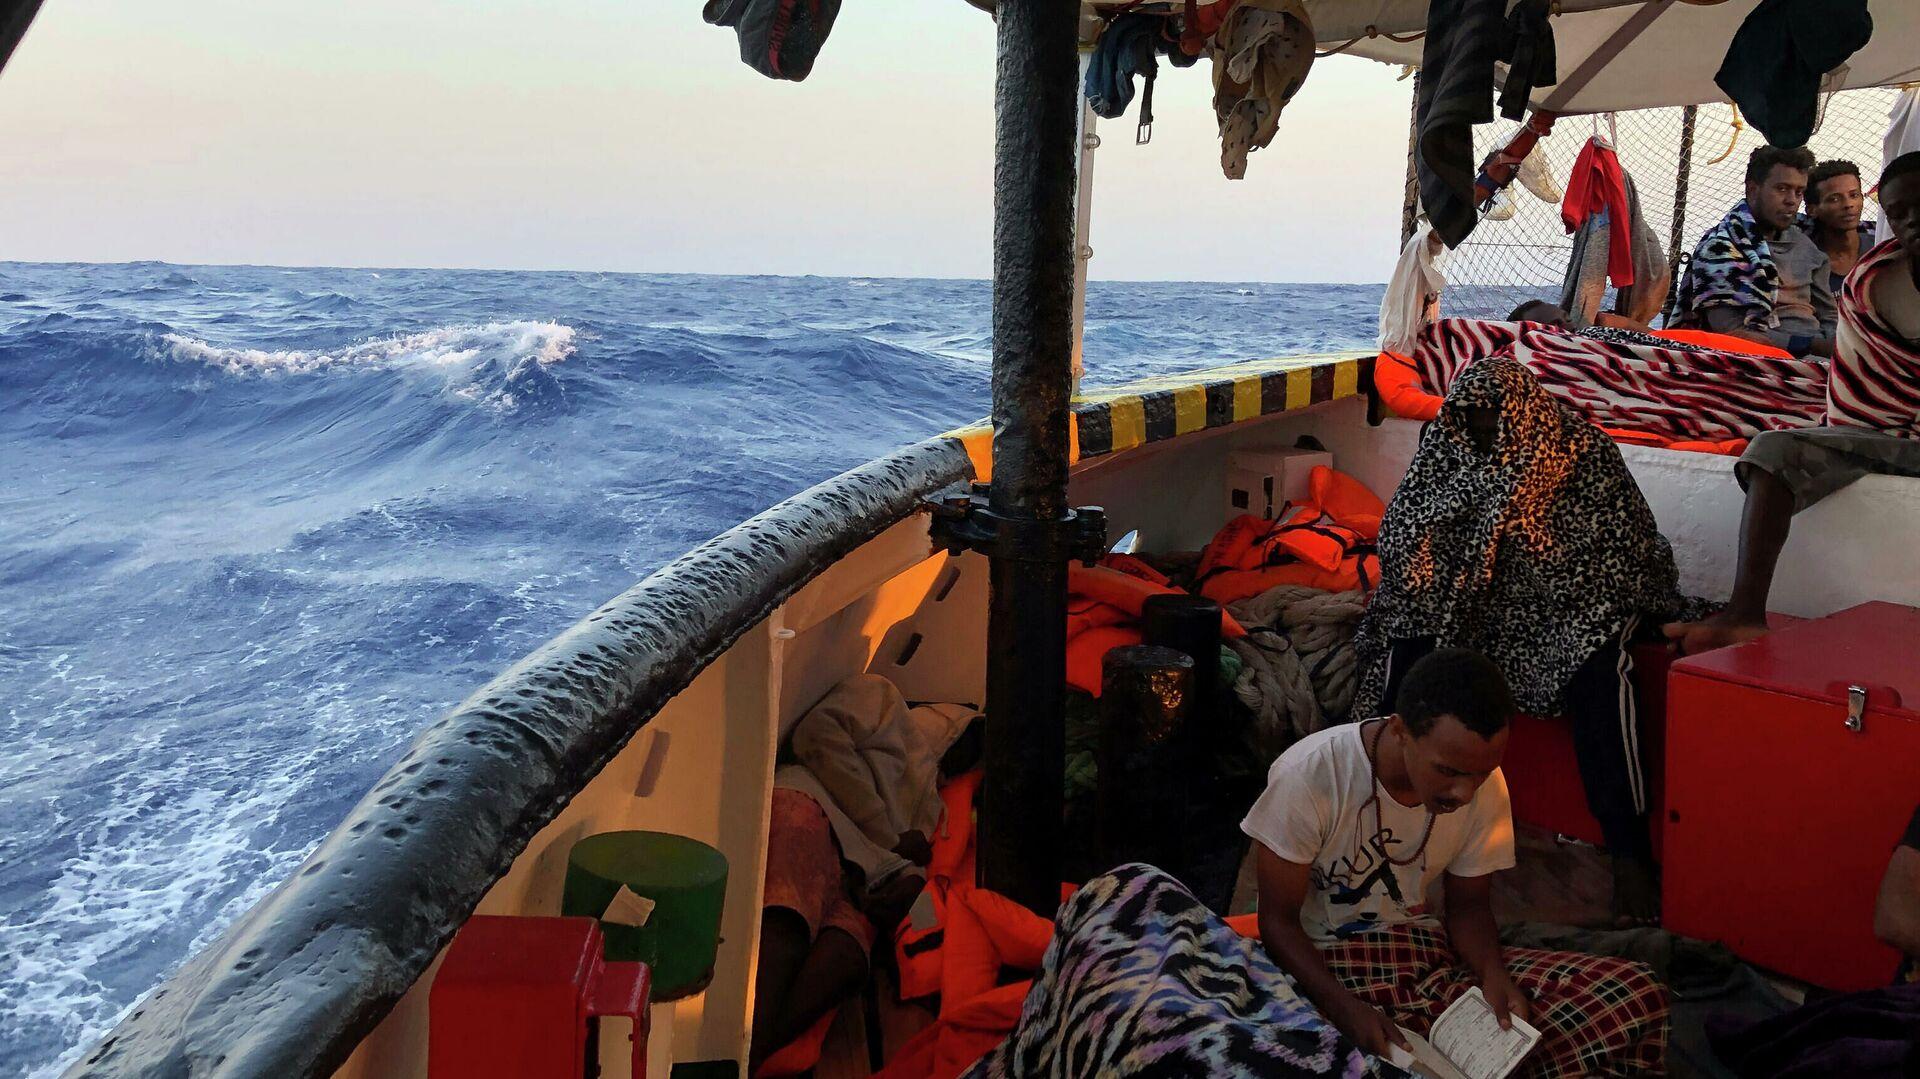 Мигрант читает Коран на борту судна испанских спасателей Open Arms в Средиземном море - Sputnik Italia, 1920, 27.05.2021